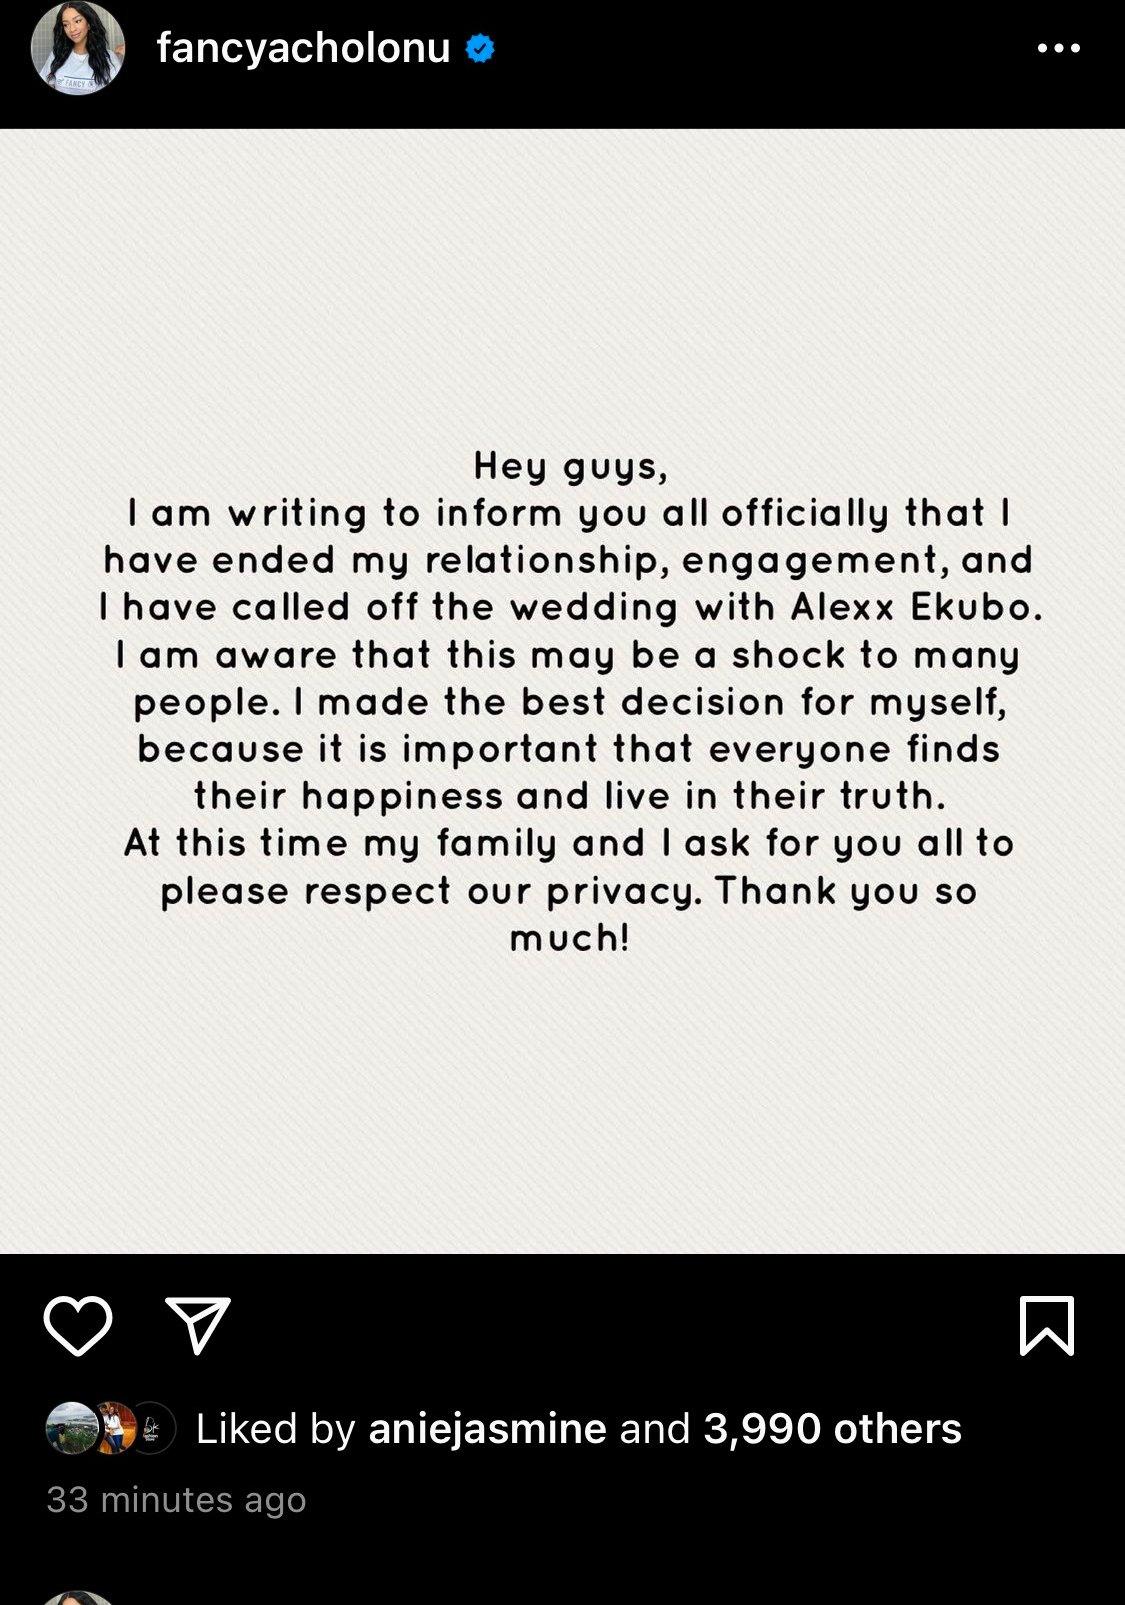 """I Made Best Decision For Myself"" - Fancy Acholonu Confirms Breakup With Alexx Ekubo"